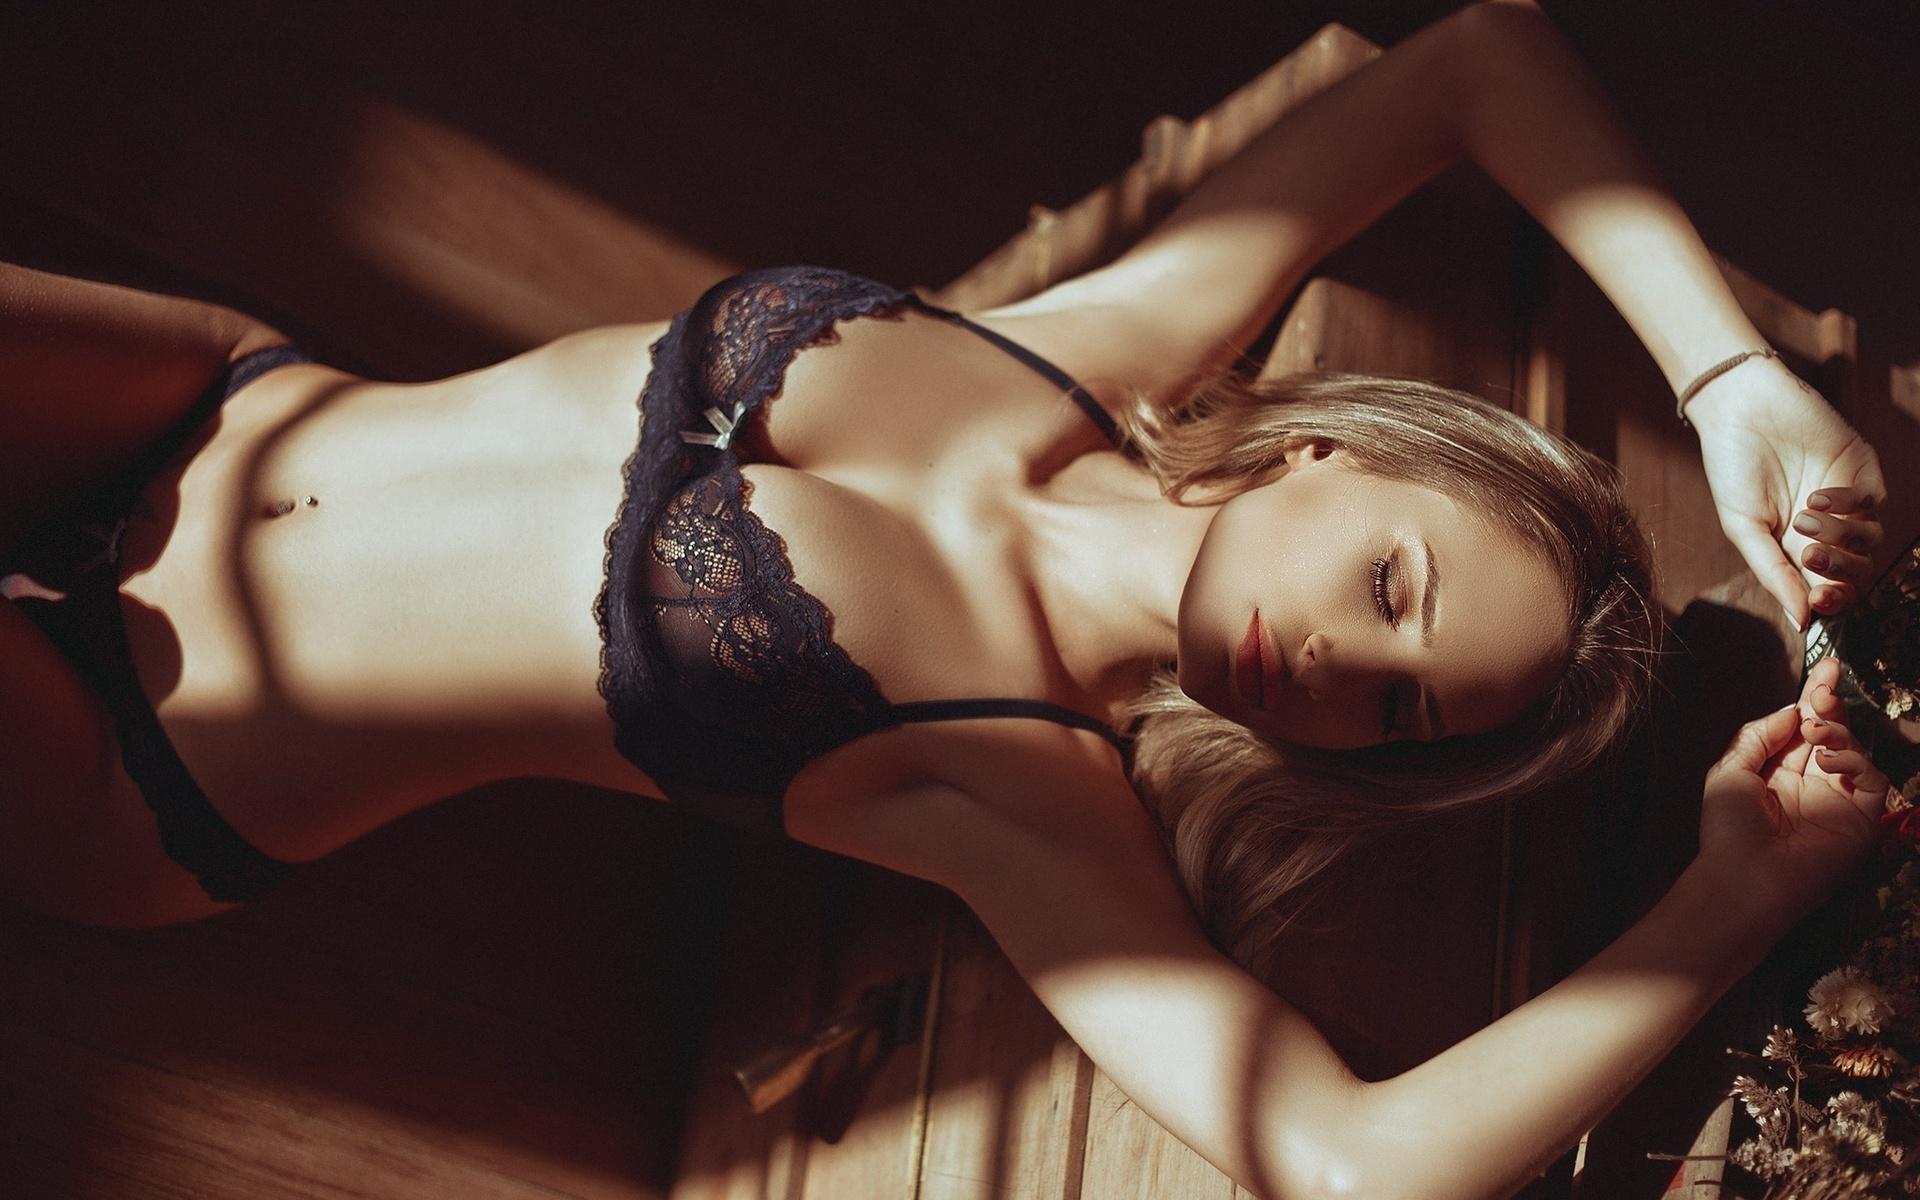 Women nipple body sex #4